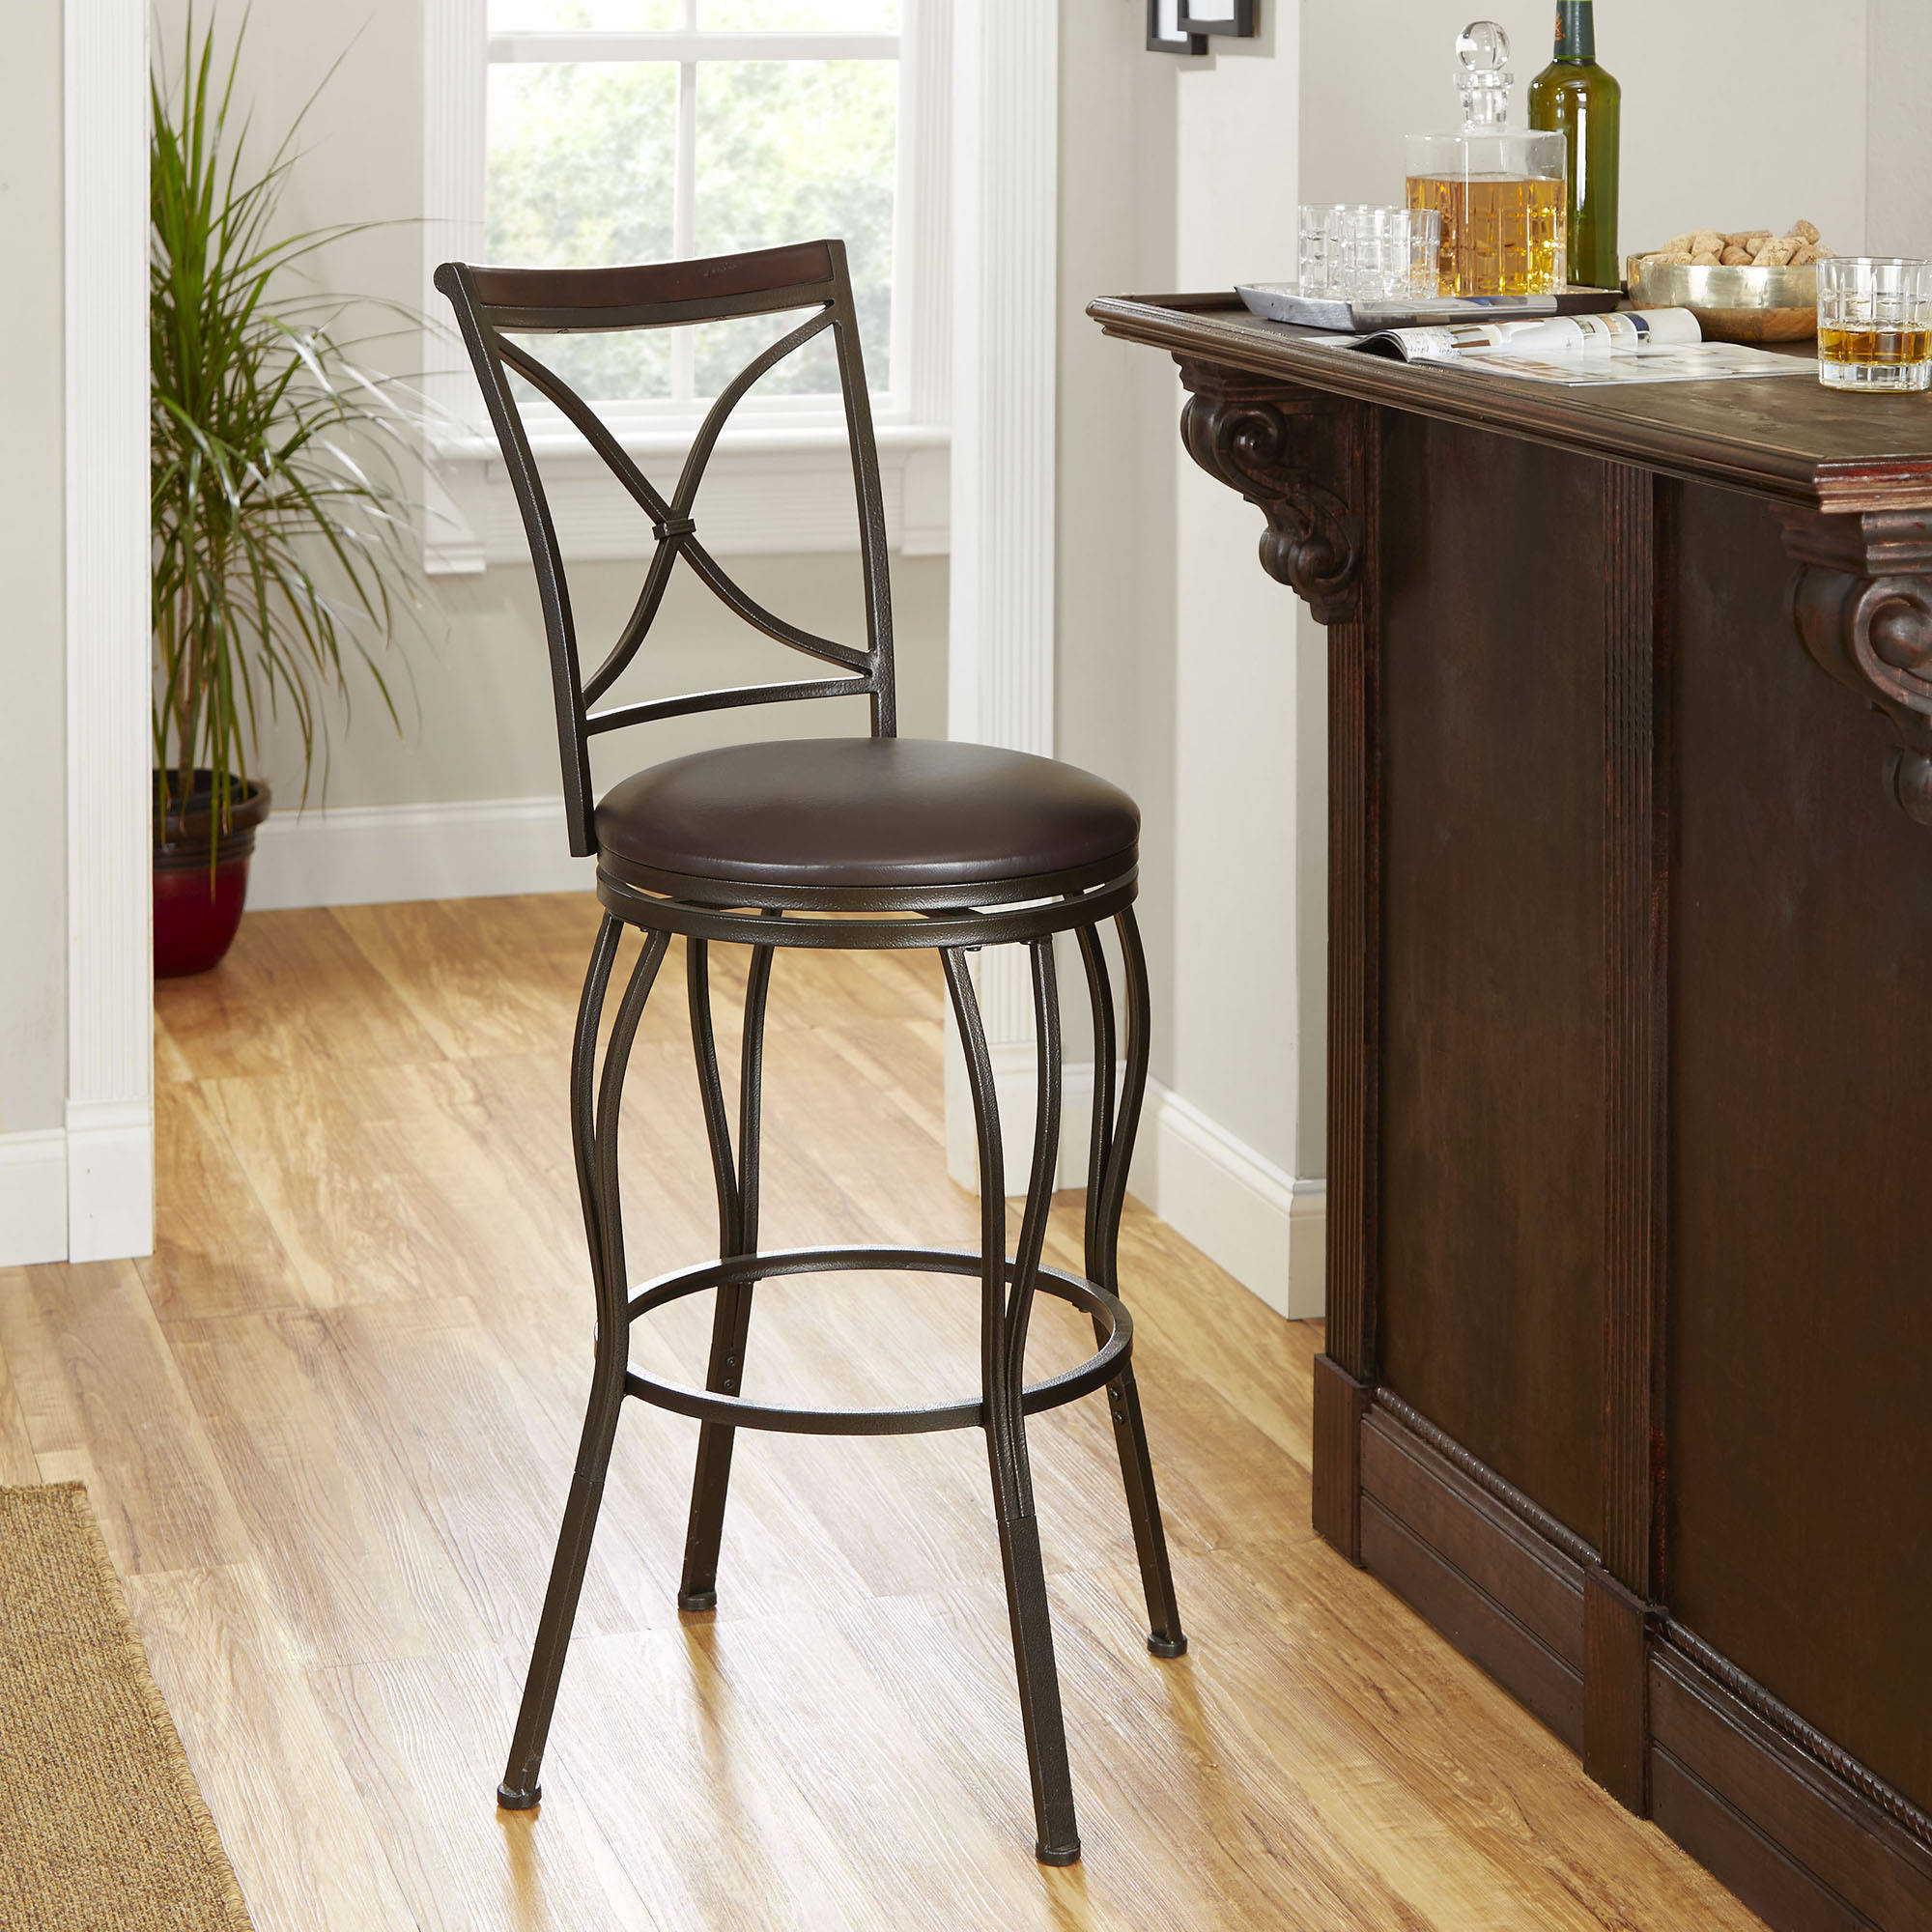 Cameron Adjustable Height Barstool With Swivel Seat